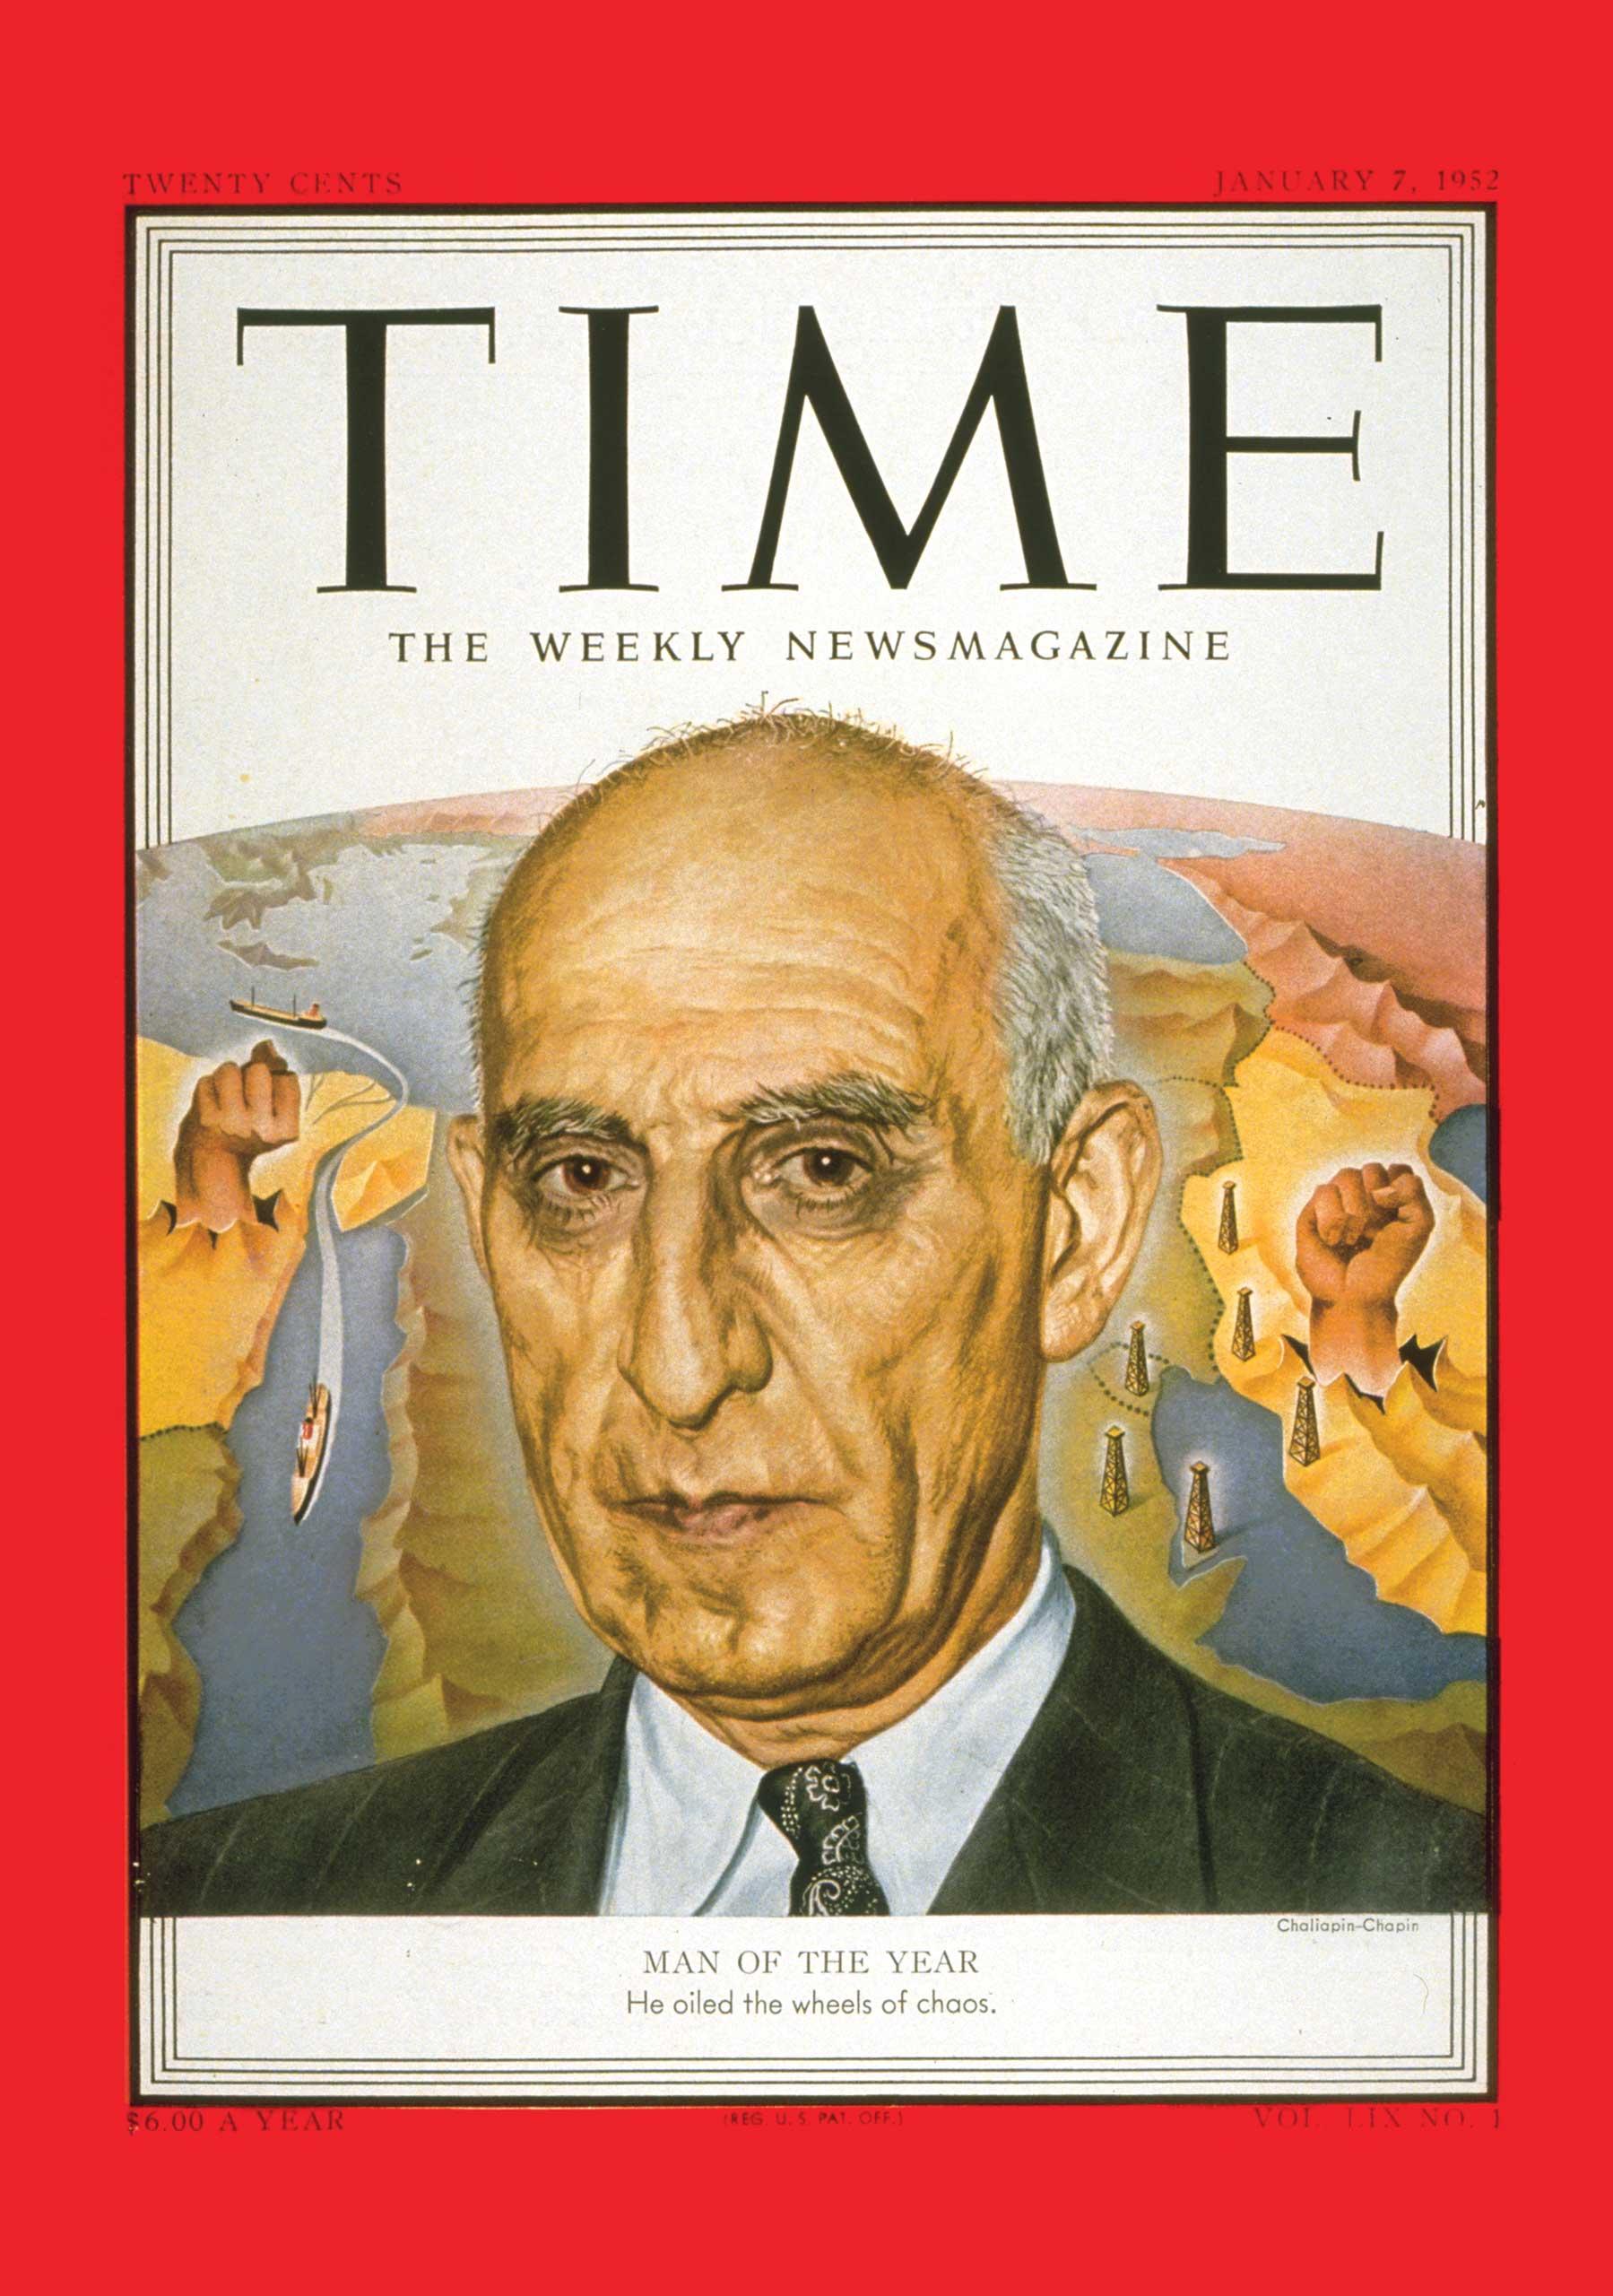 1951: Mohammad Mossadegh